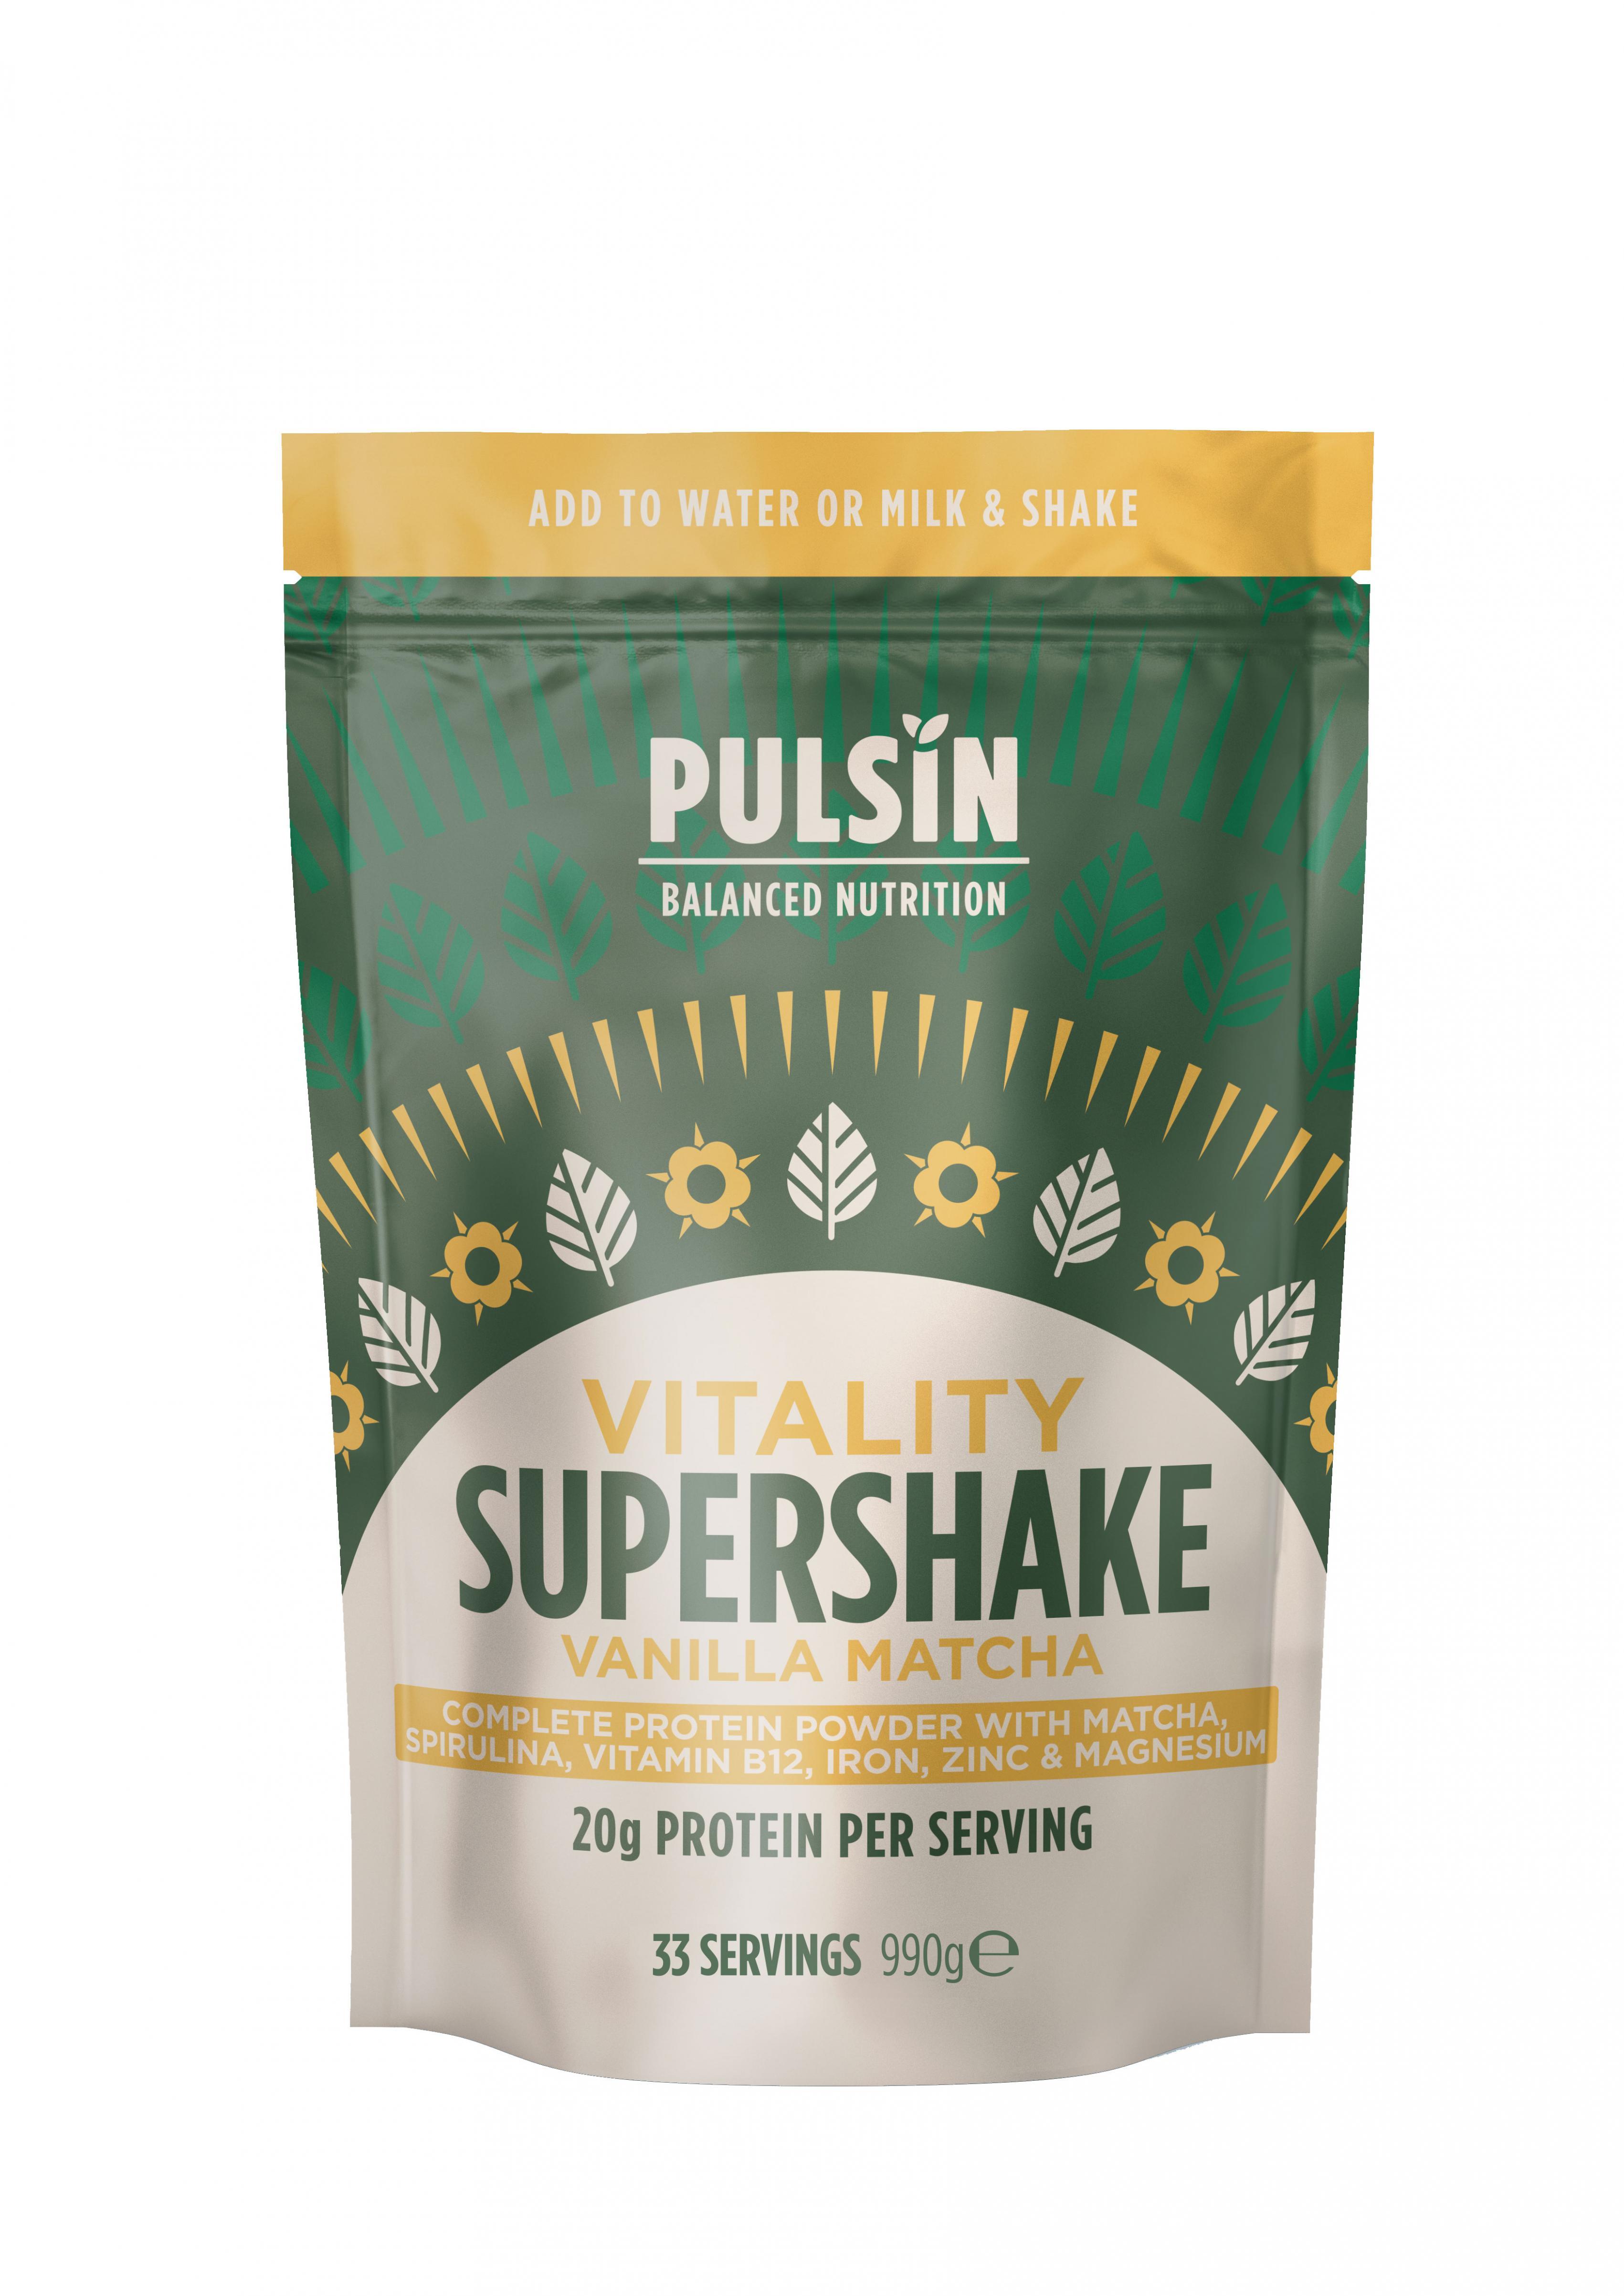 Vitality Supershake Vanilla Matcha 990g